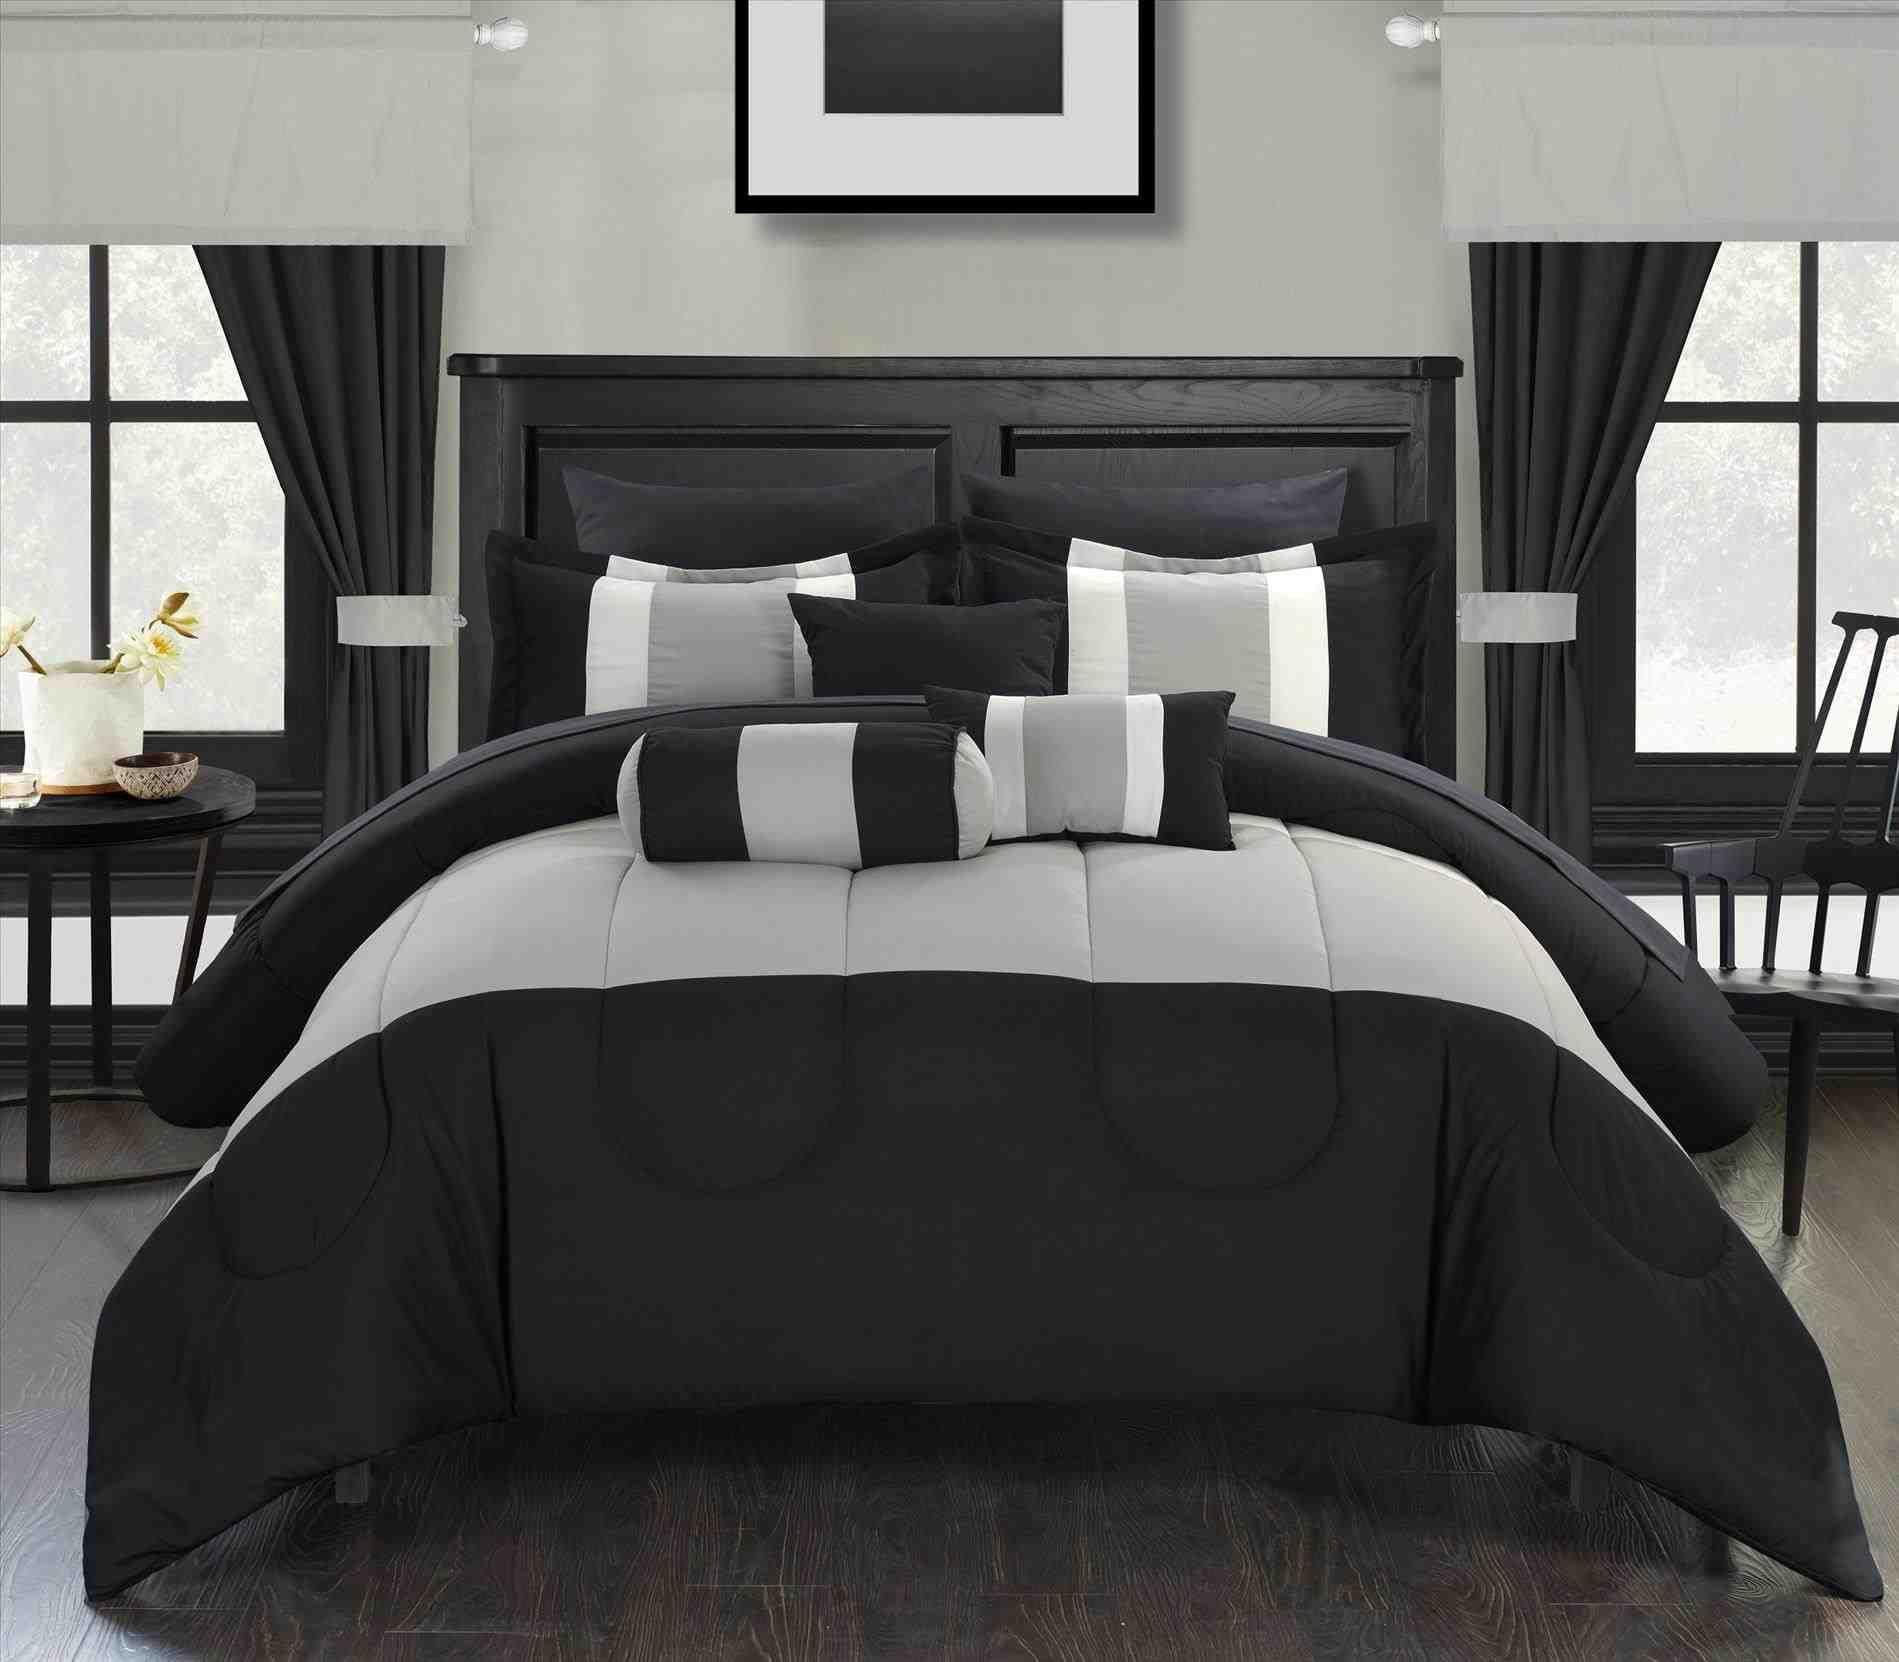 full size of bedroom bachelor pad art